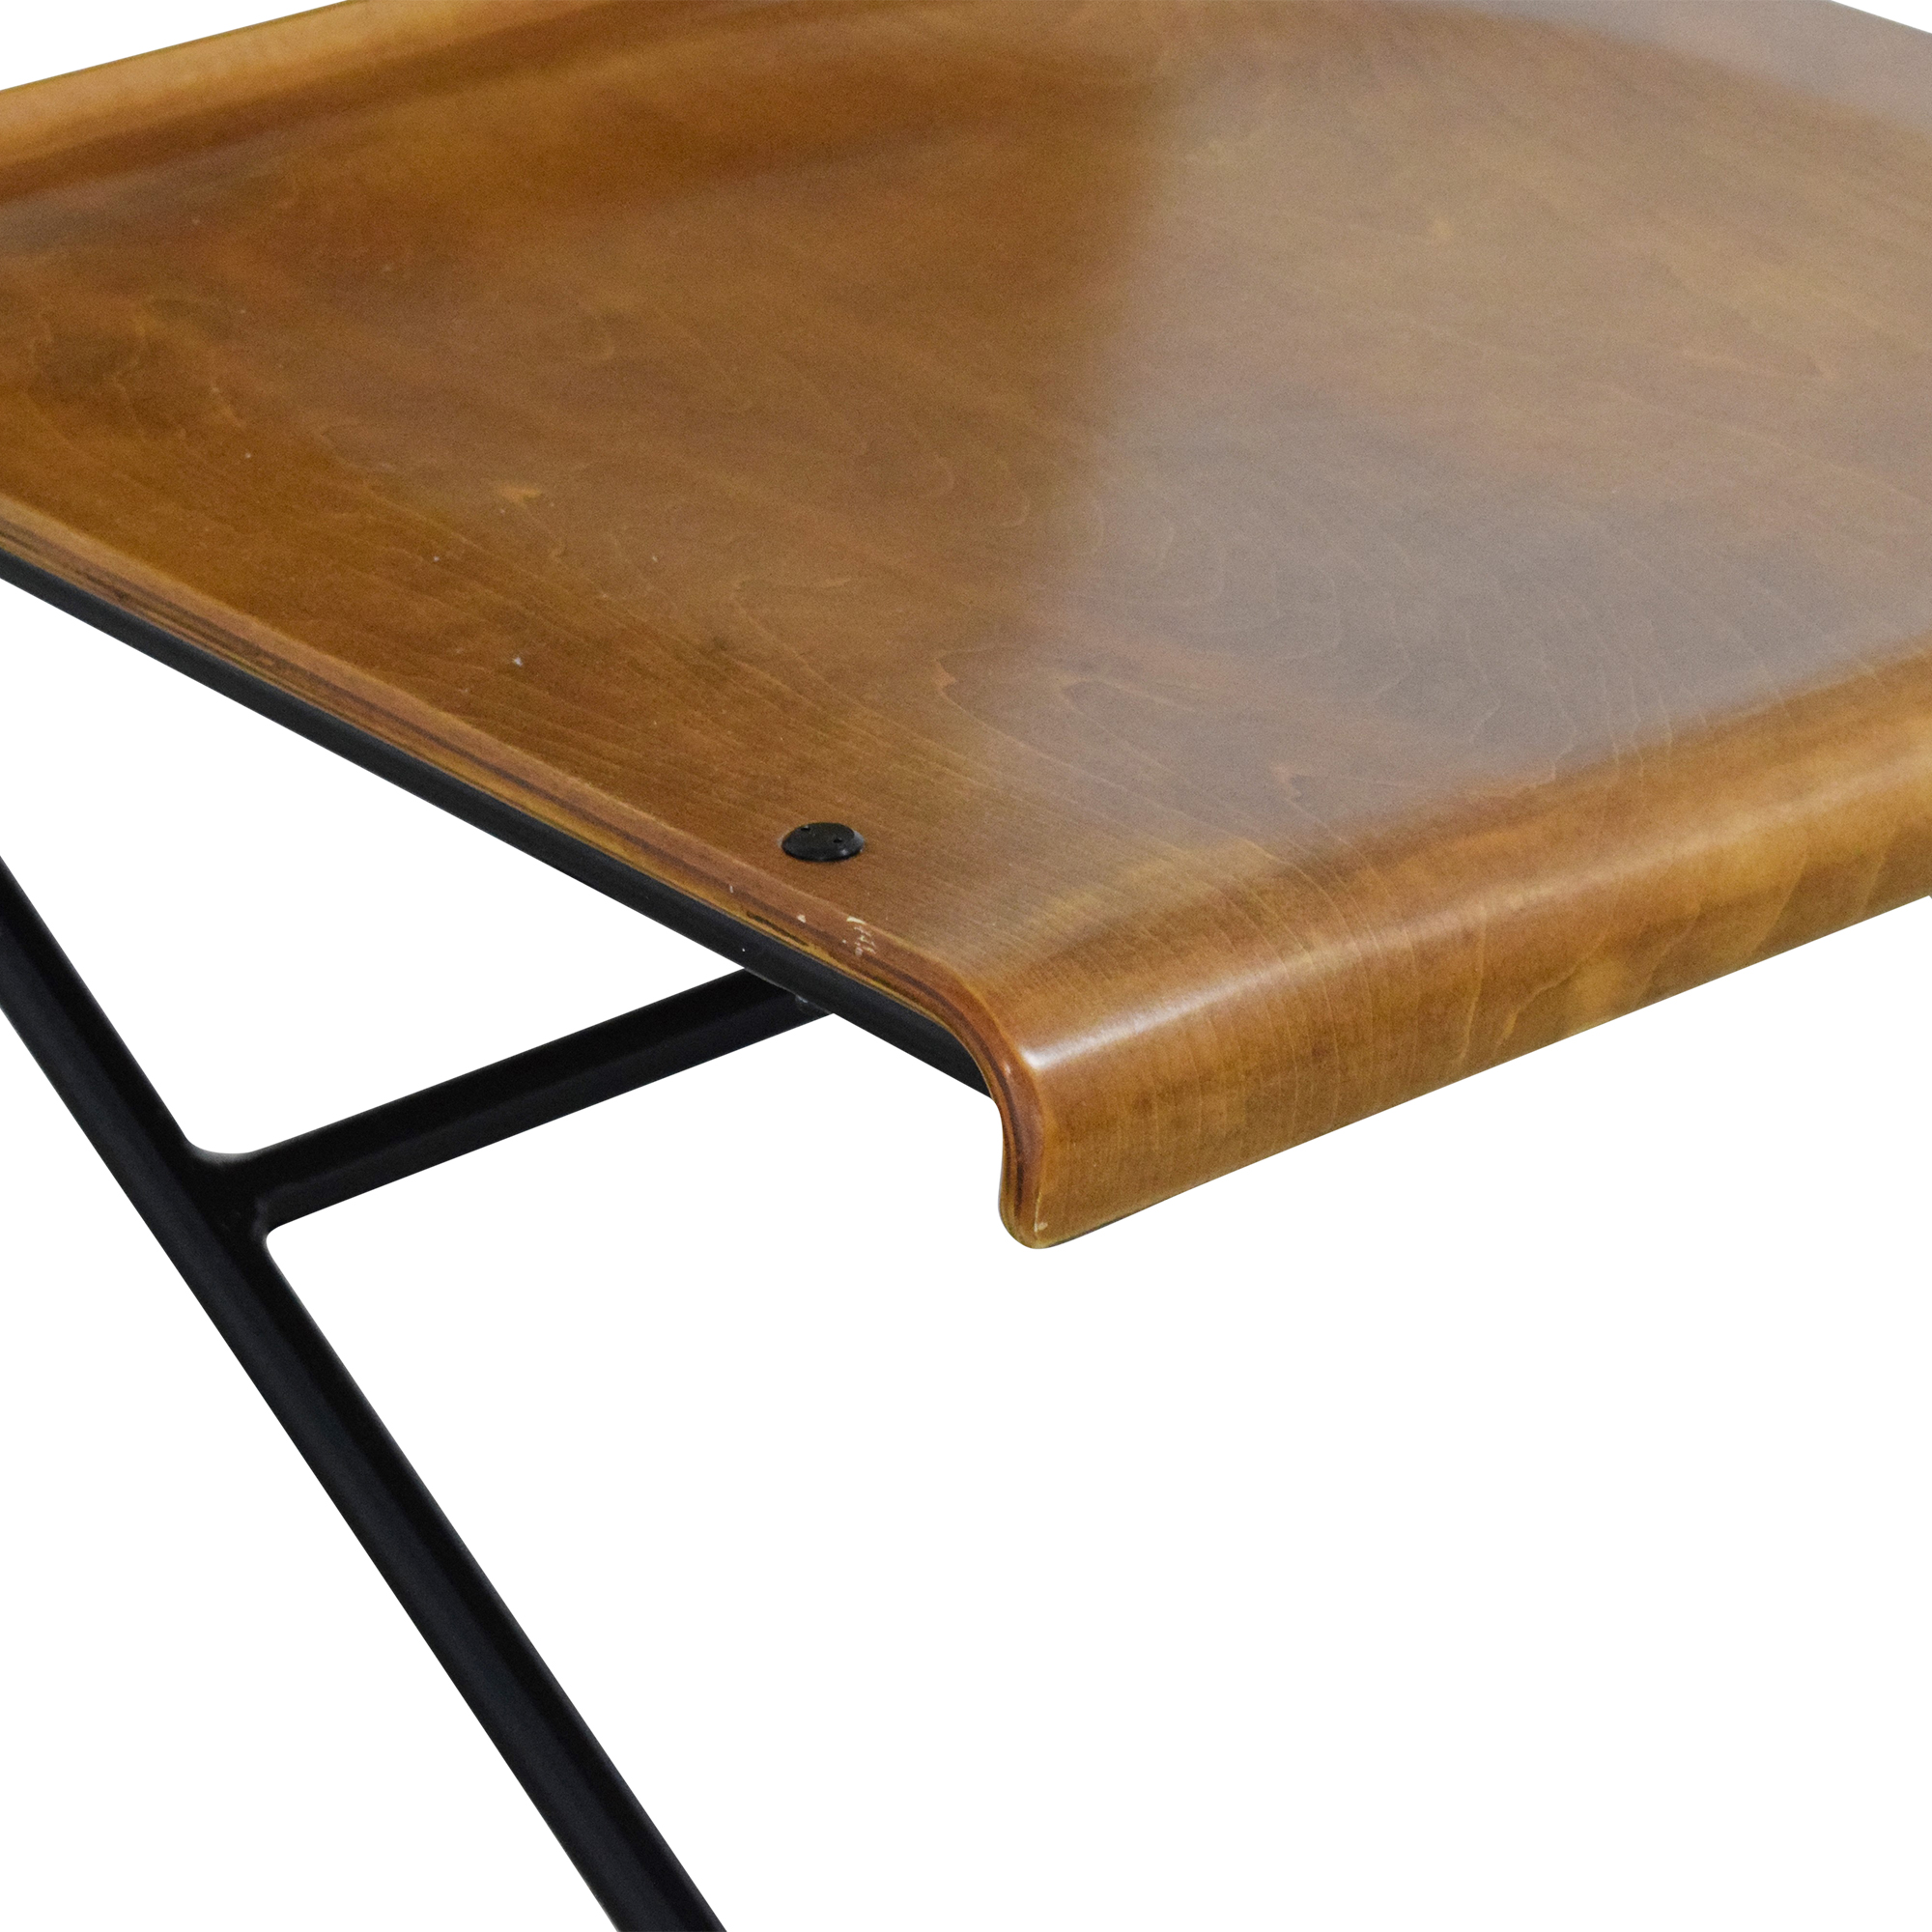 Industry West Industry West Stride Lounge Chair brown & black